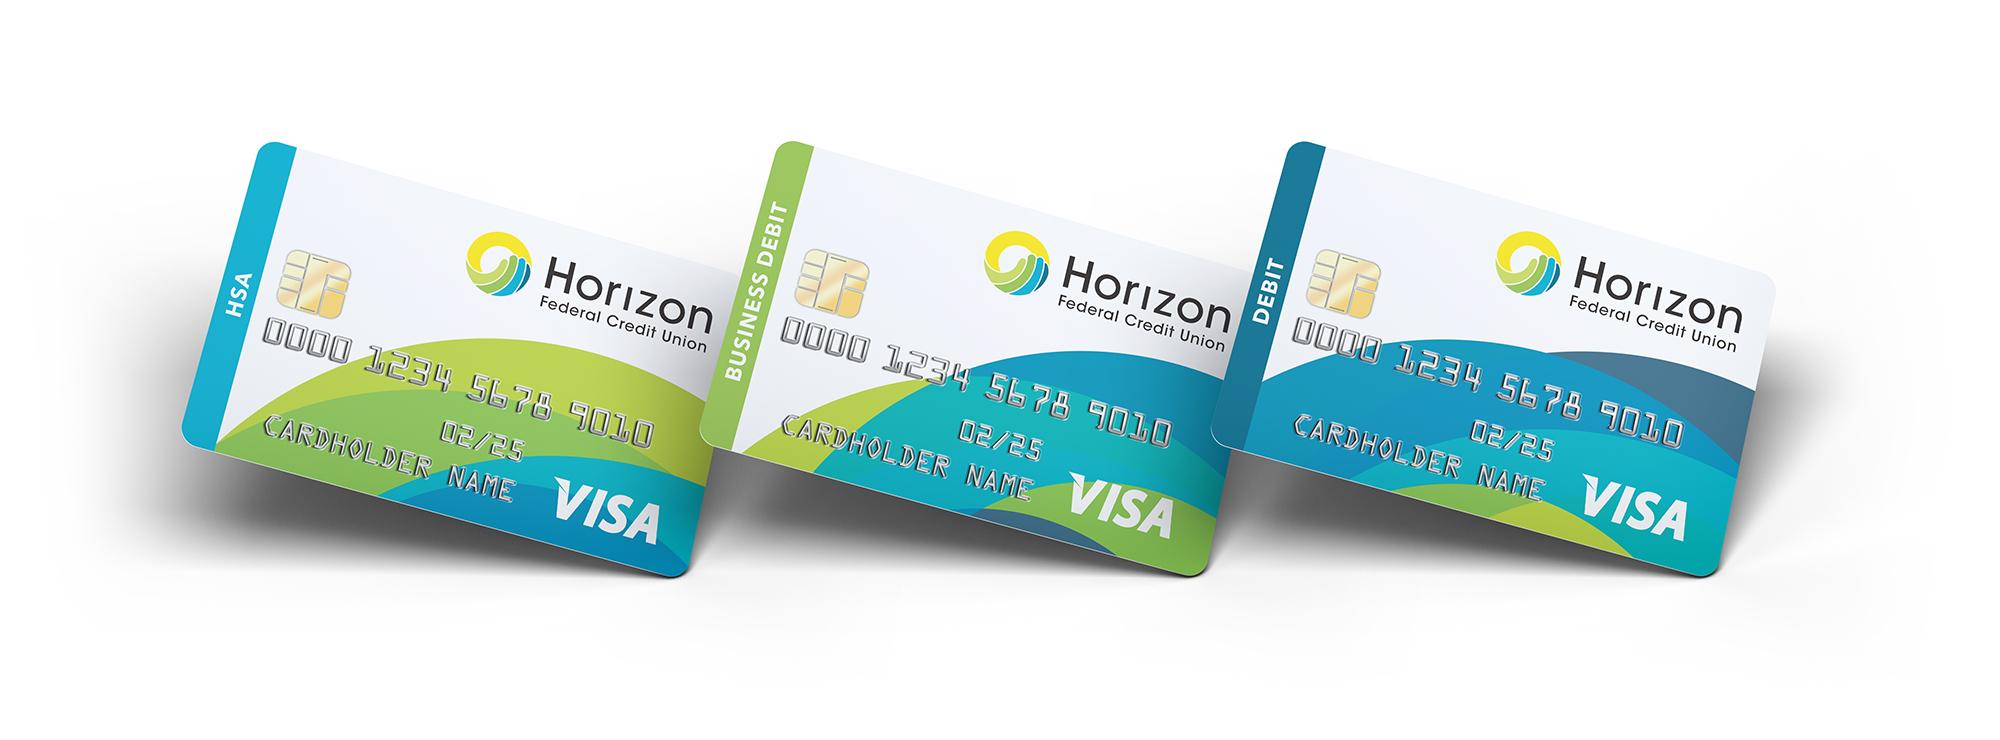 horizonfcu-credit-cards